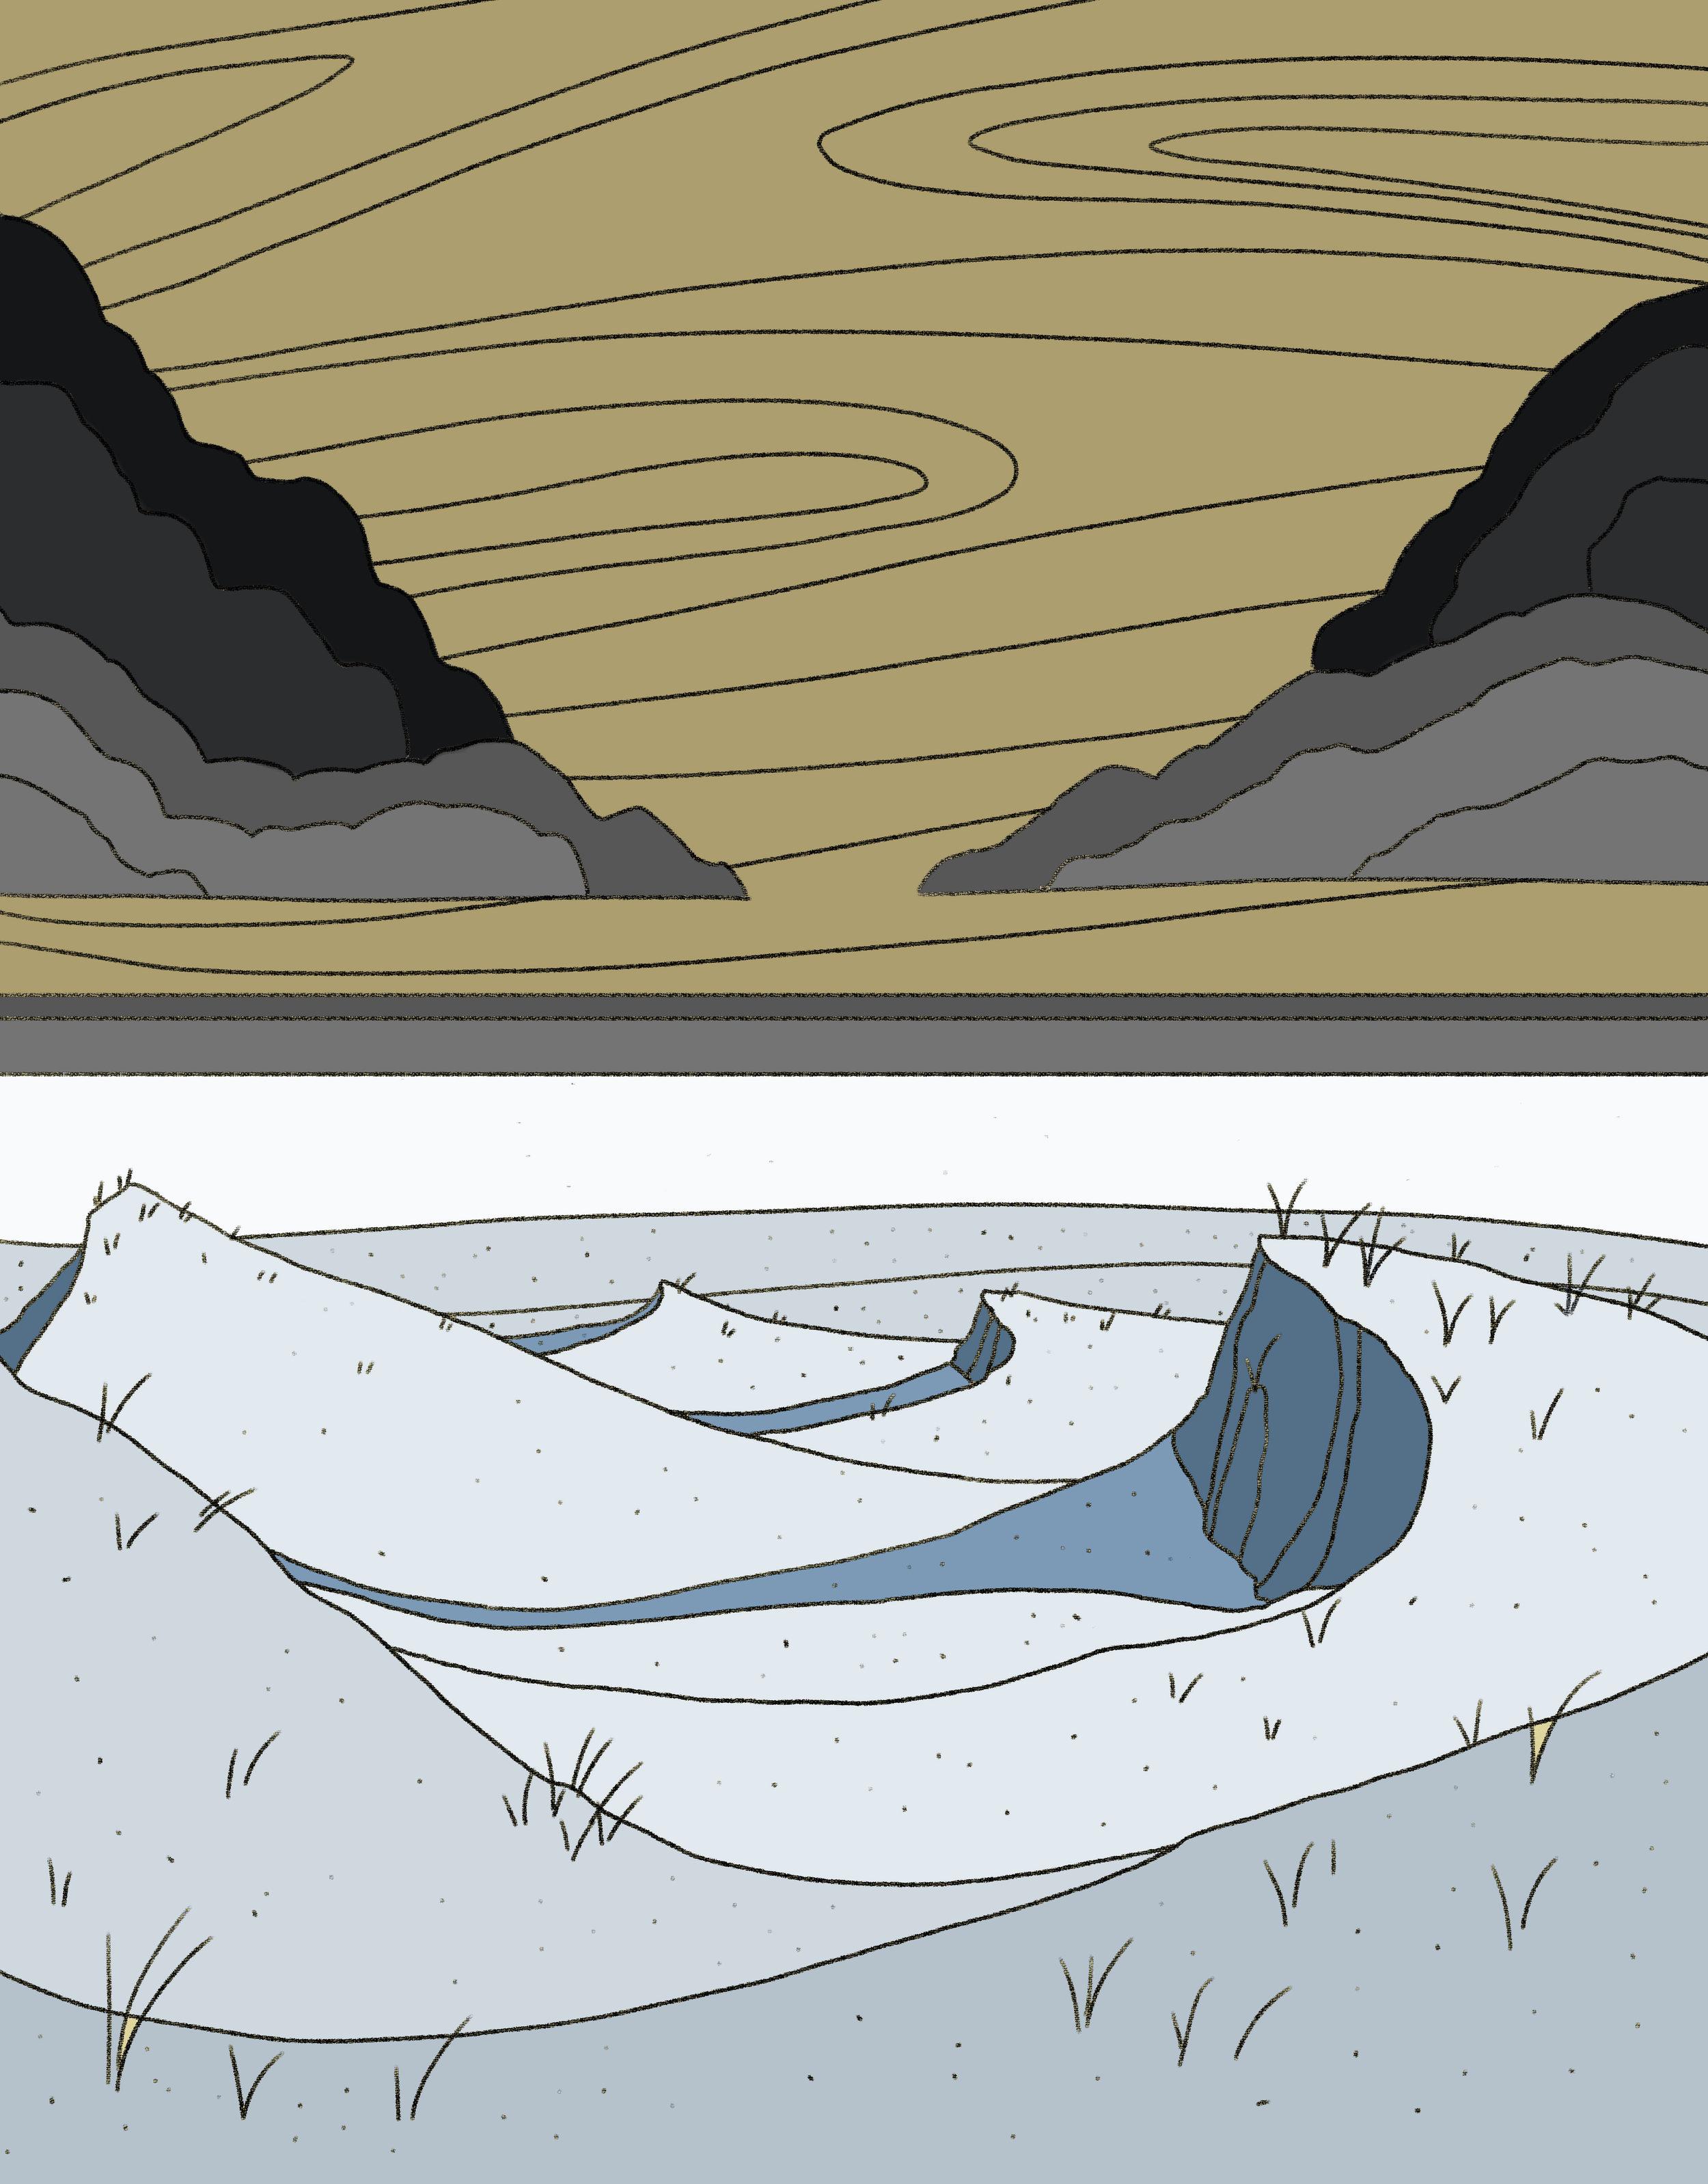 Landscapes: Storm's Coming